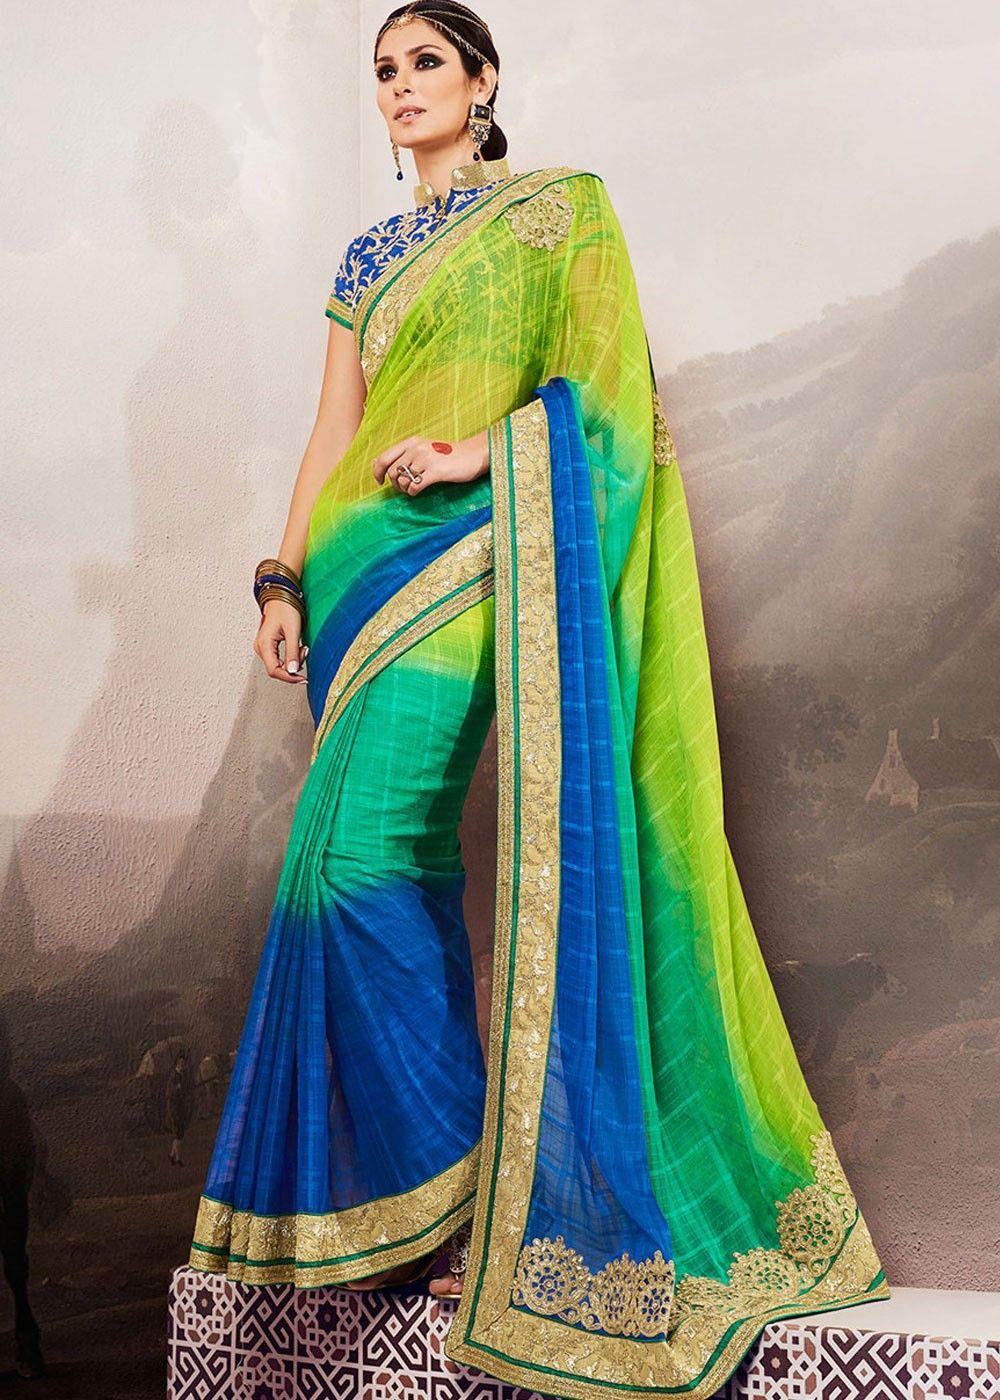 Bruna Laila bruna abdullah shaded green and blue chiffon brasso saree